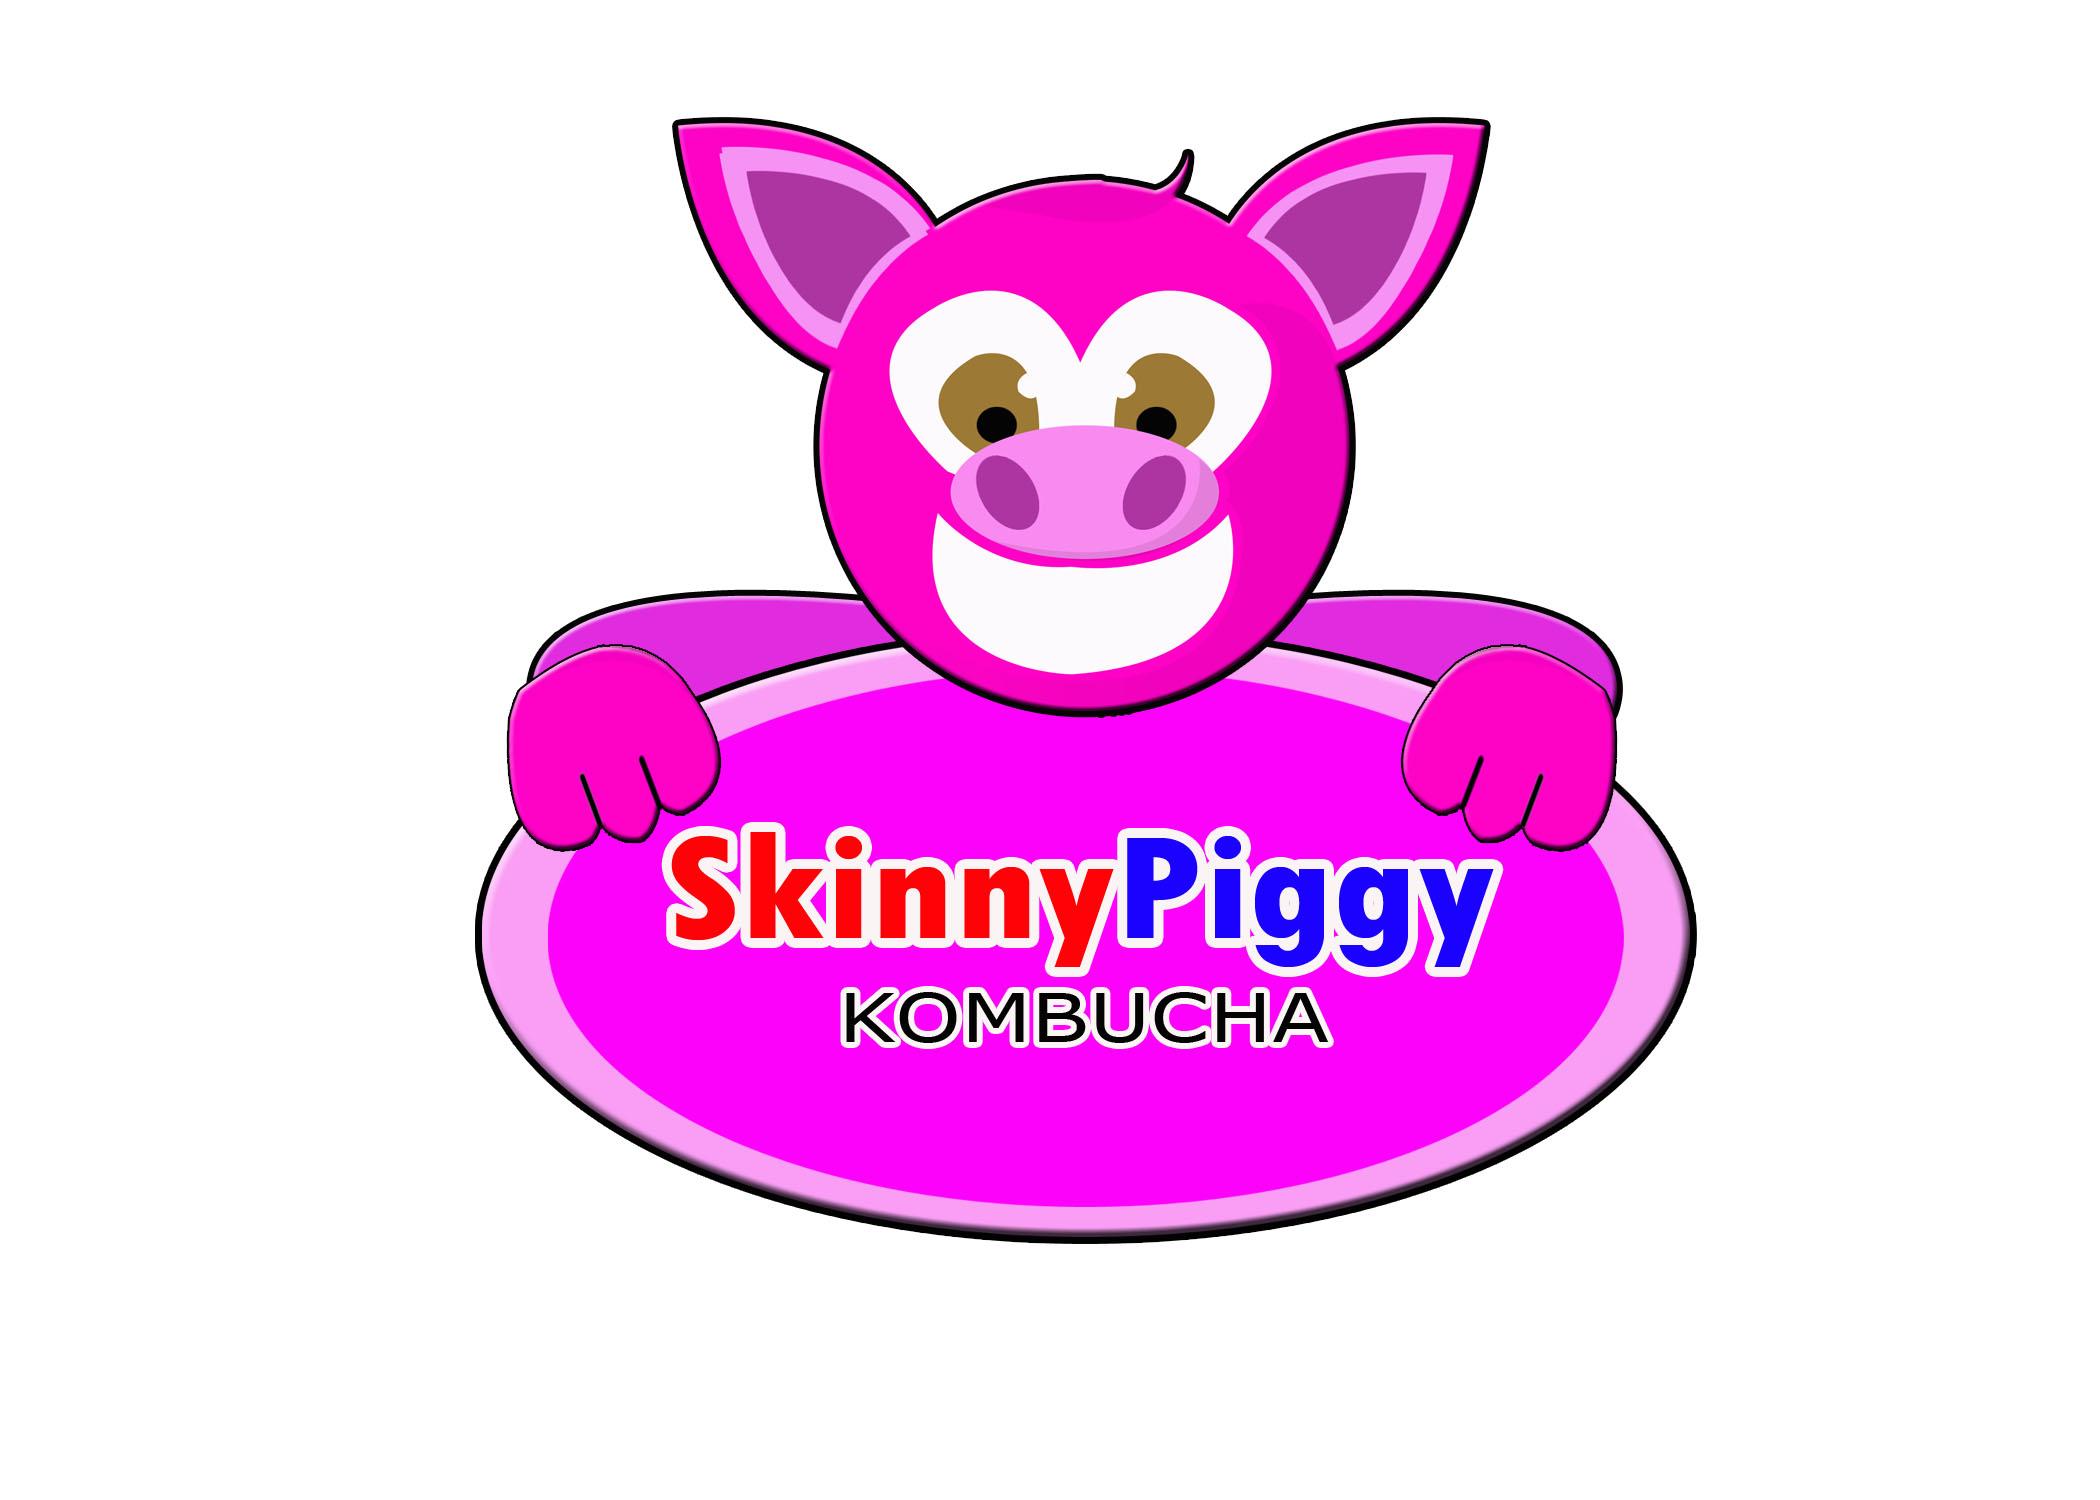 Logo Design by Jesther Jordan Minor - Entry No. 56 in the Logo Design Contest Fun Logo Design for Skinny Piggy.